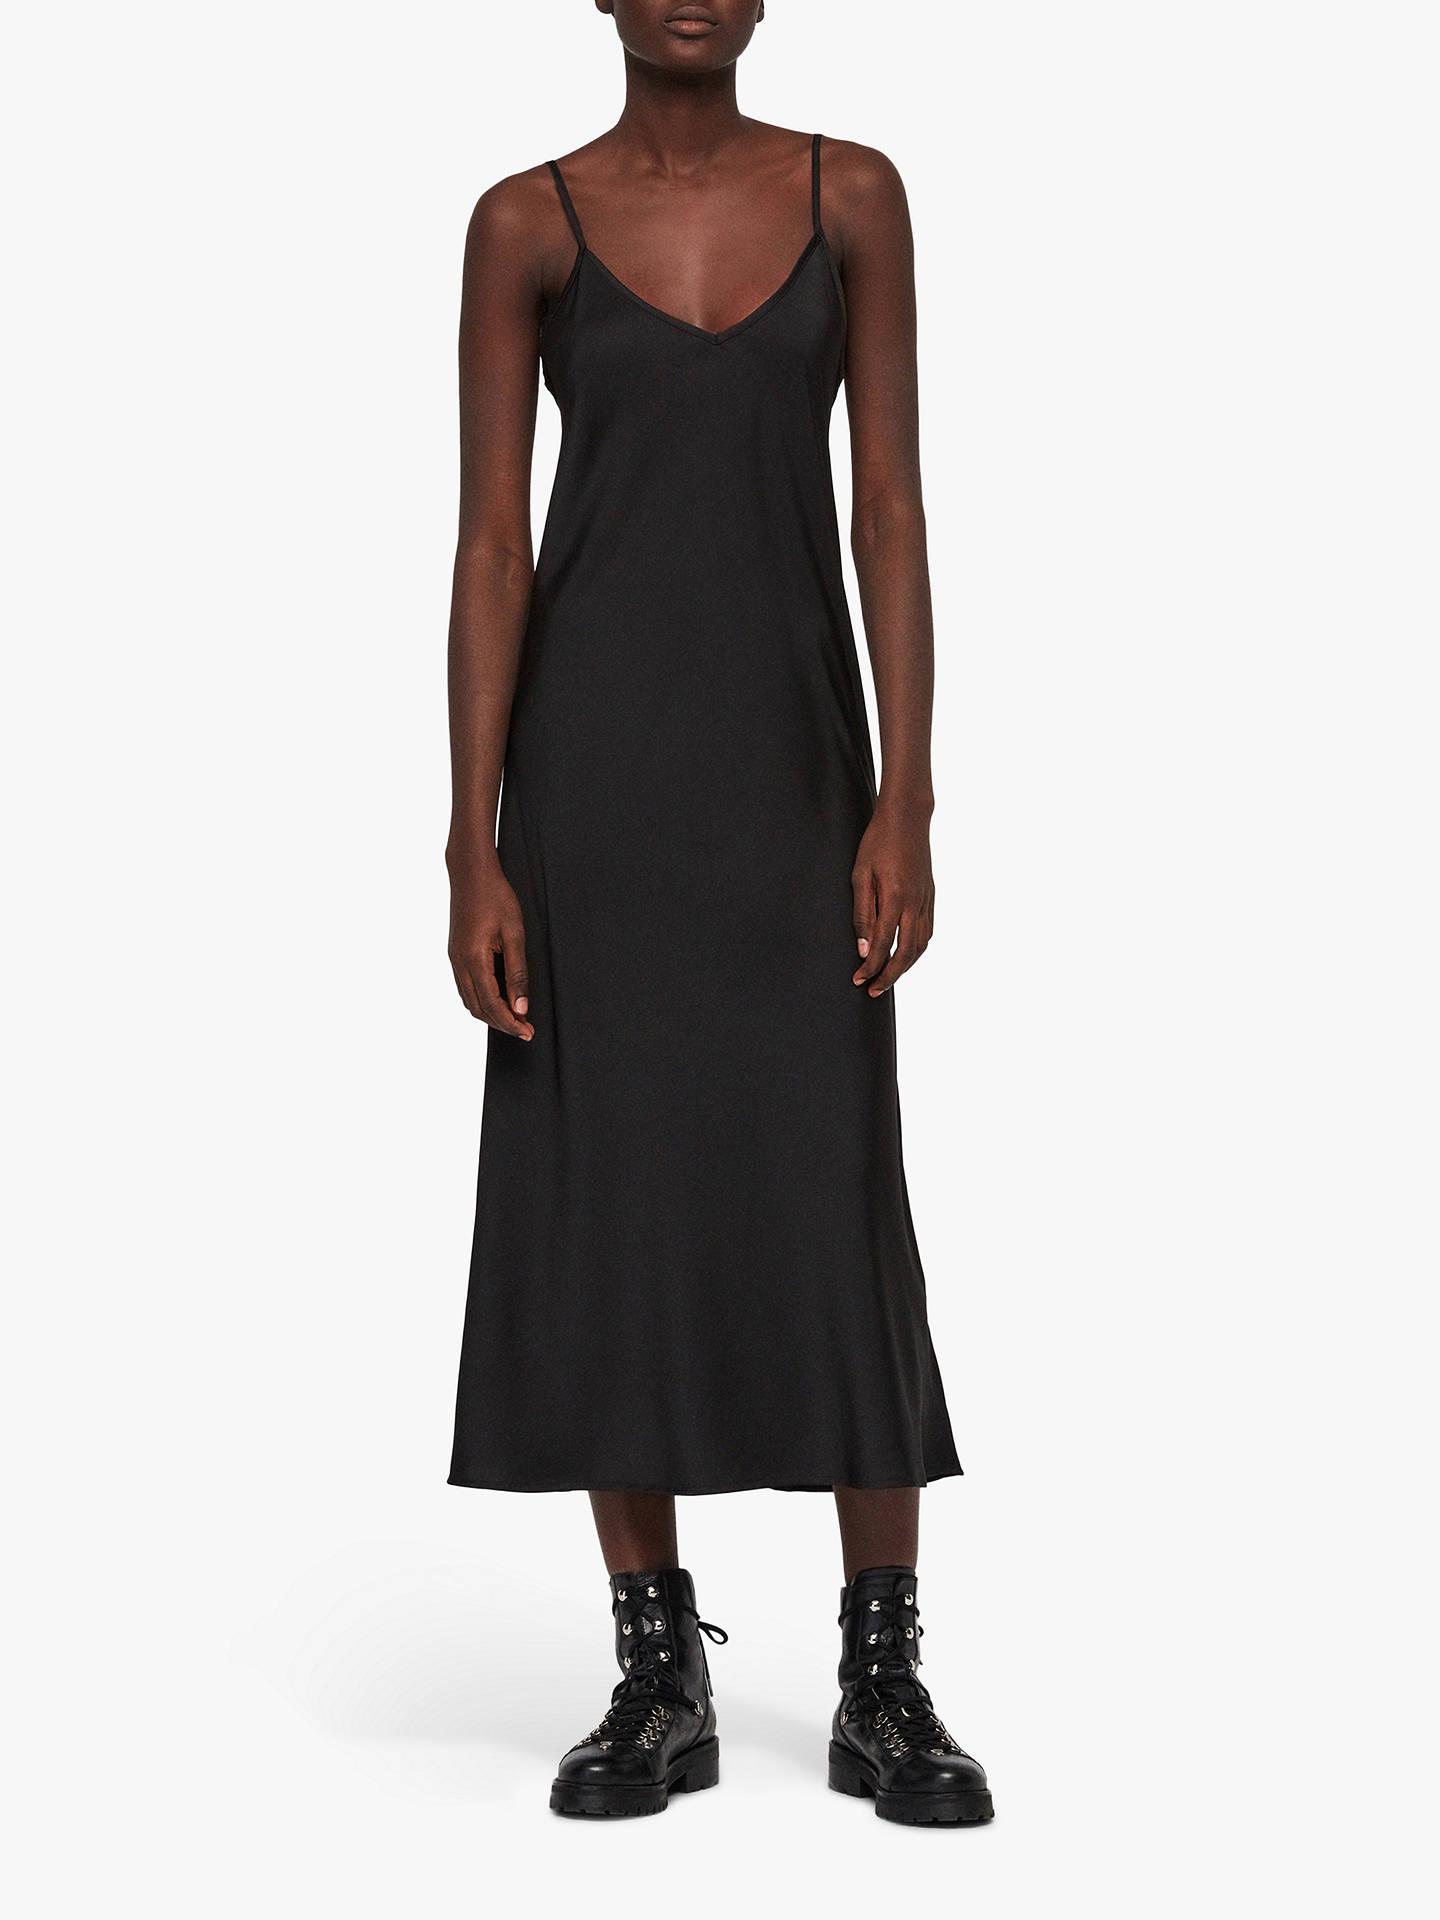 684addfe32e8 ... Buy AllSaints Benno Tee Dress, Black, XS Online at johnlewis.com ...